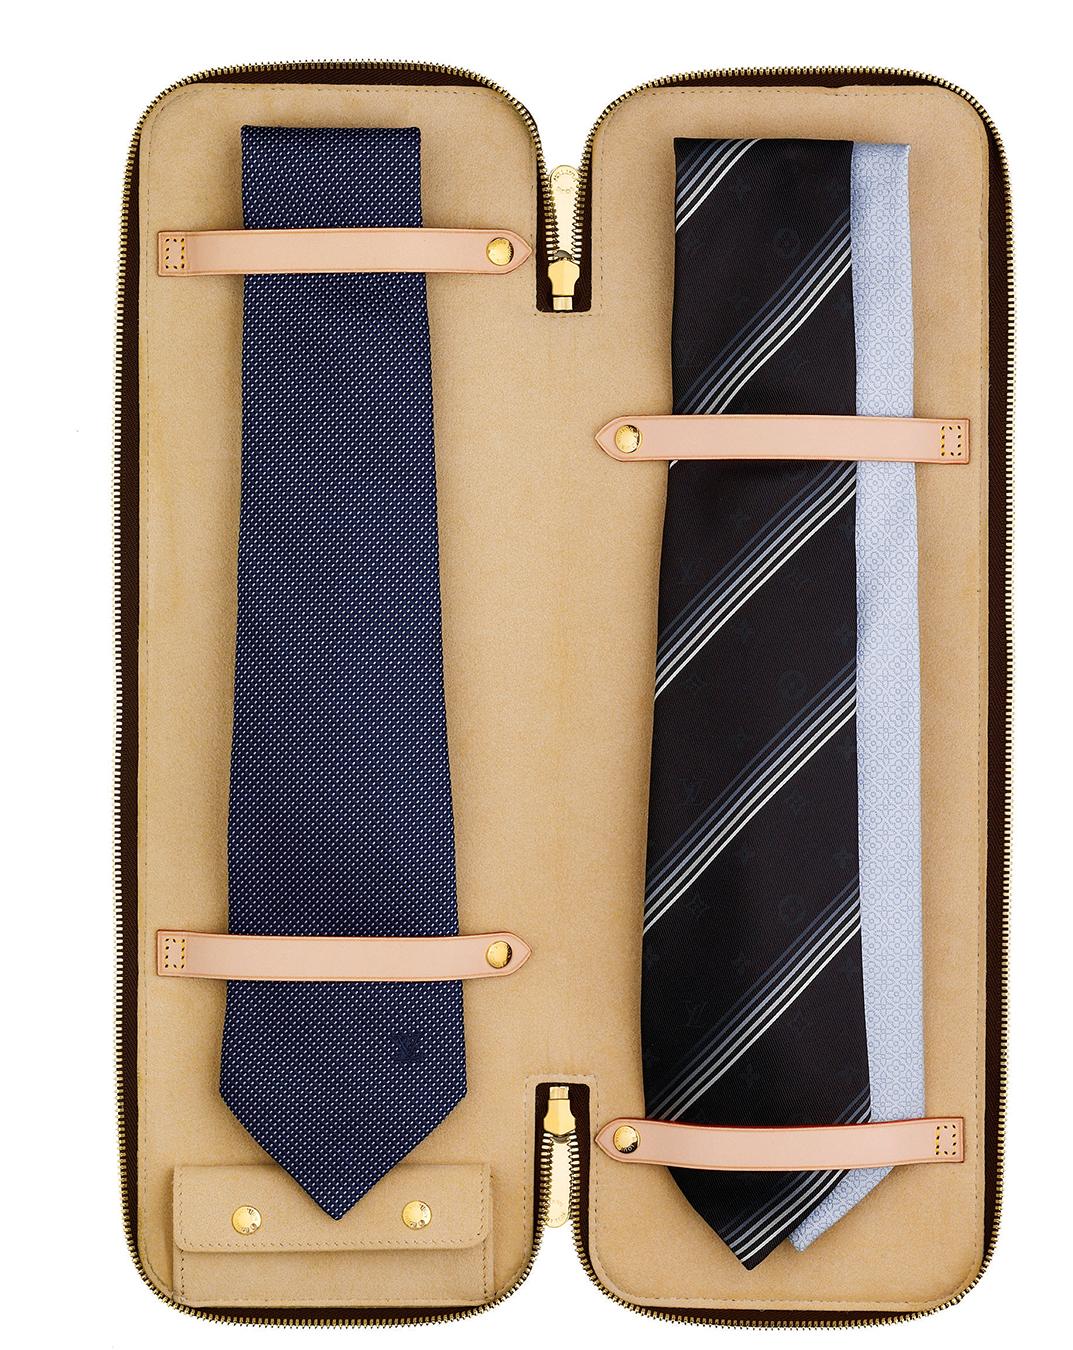 Nuvo Magazine: Louis Vuitton Tie Travel Case